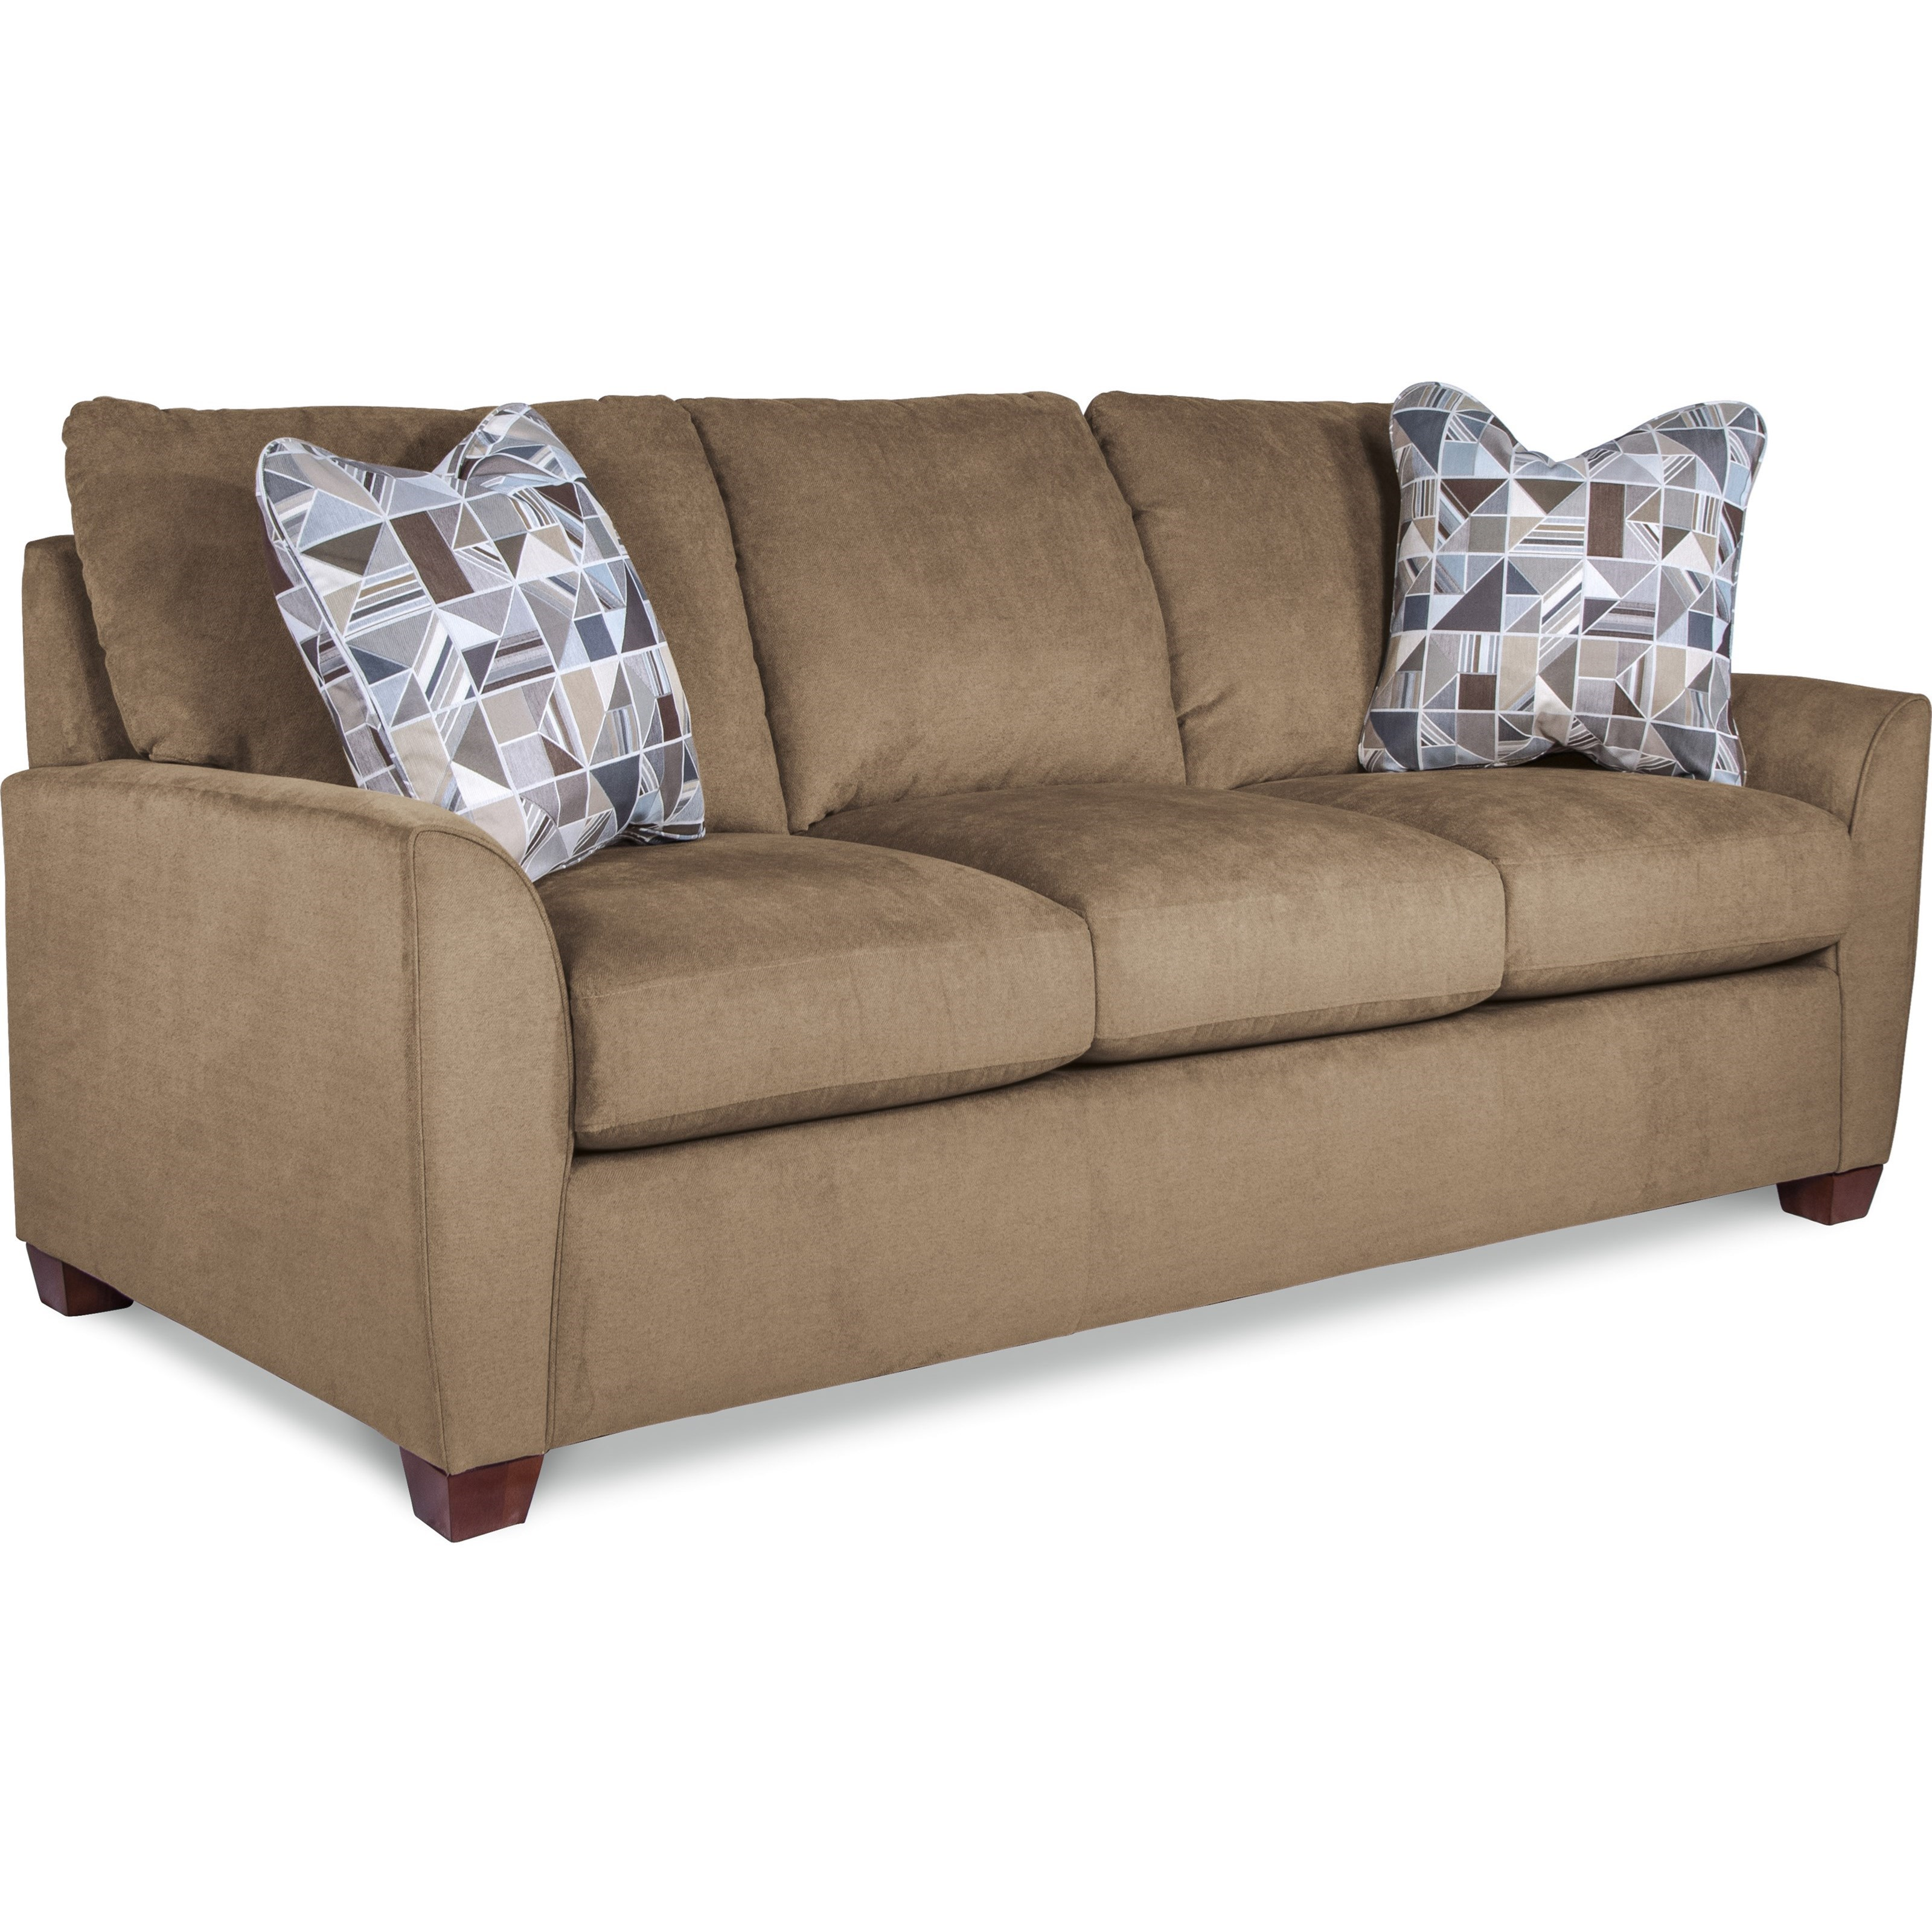 La Z Boy Amy Casual Supreme Comfort Queen Sleeper Sofa